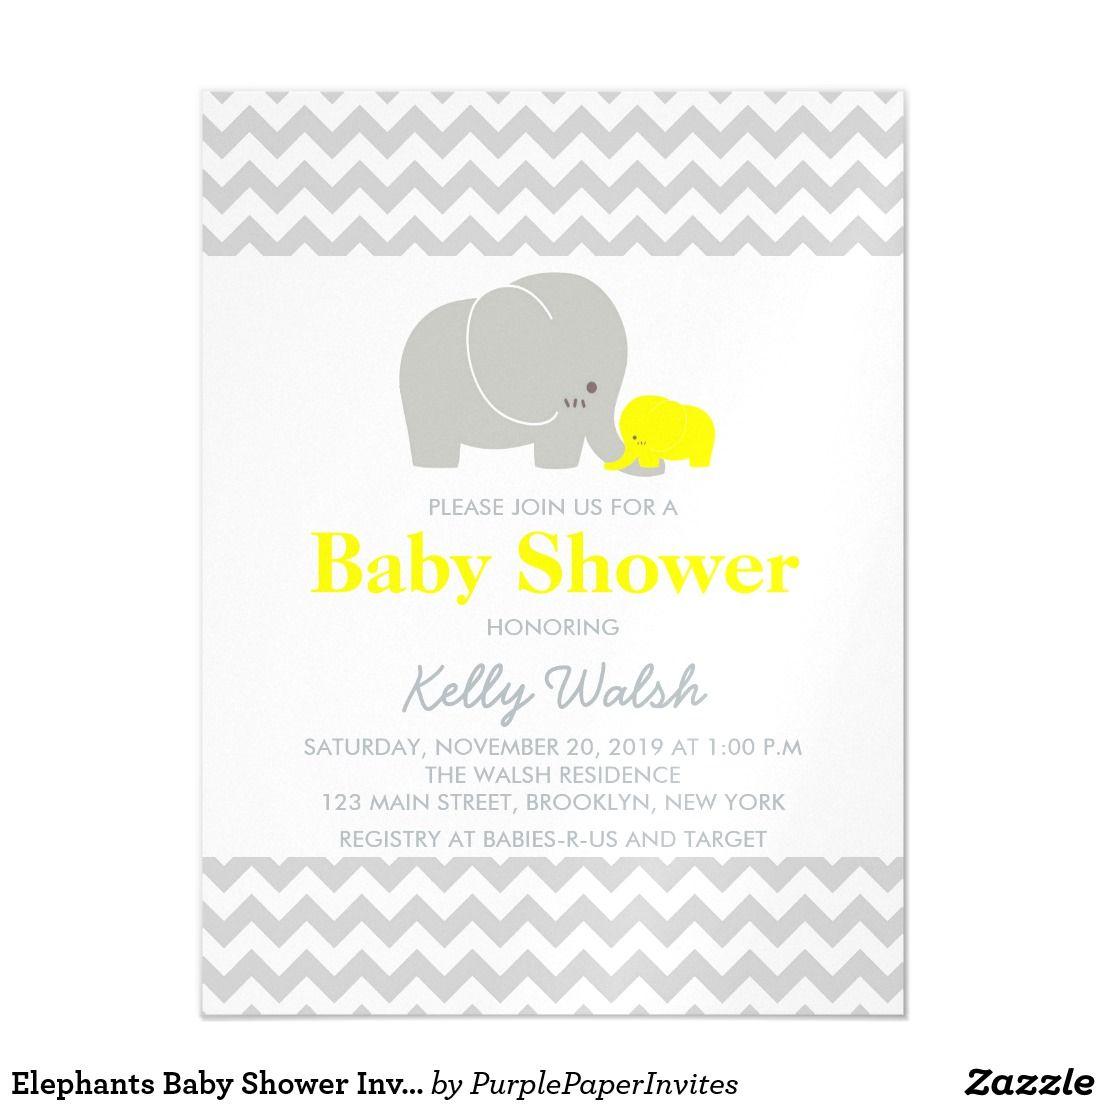 Elephants Baby Shower Invitations Chevron | Elephant baby showers ...